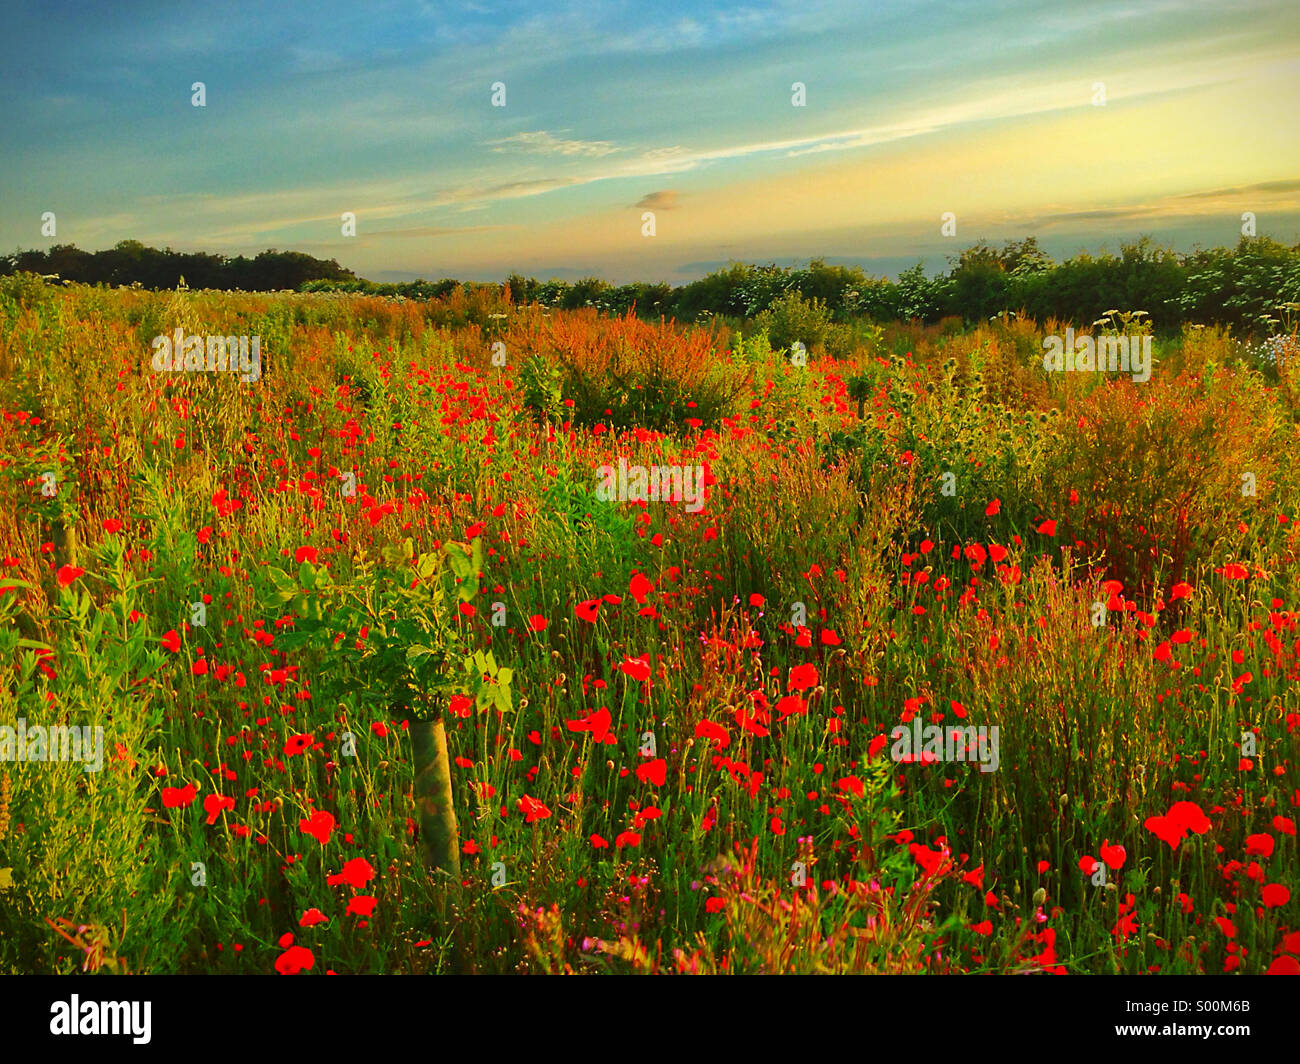 Poppy Field at Sunset Stock Photo